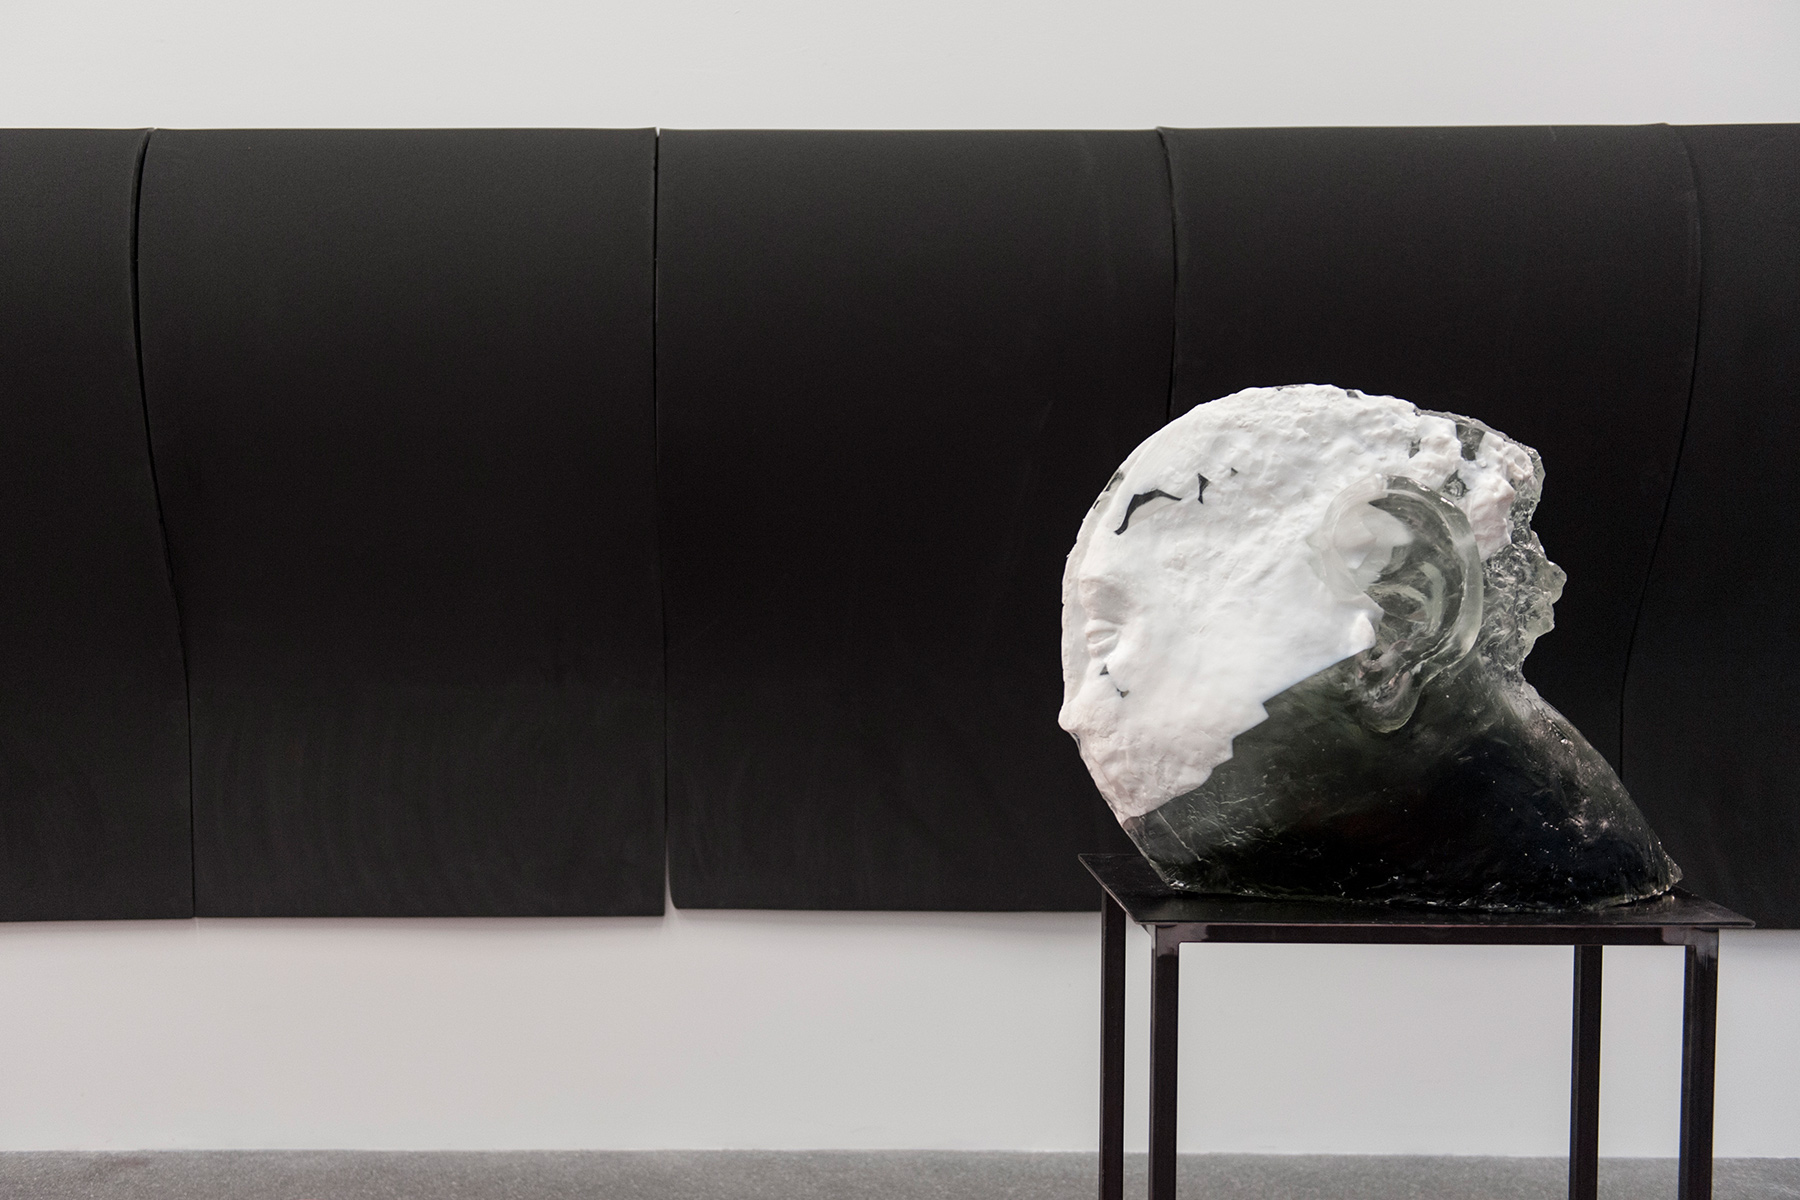 Diego Perrone, Il servo astuto, Museion, Bolzano, 2013  (Installation views) Foto Seehauser CourtesyMassimo De Carlo, Milano/Londra/Hong Kong